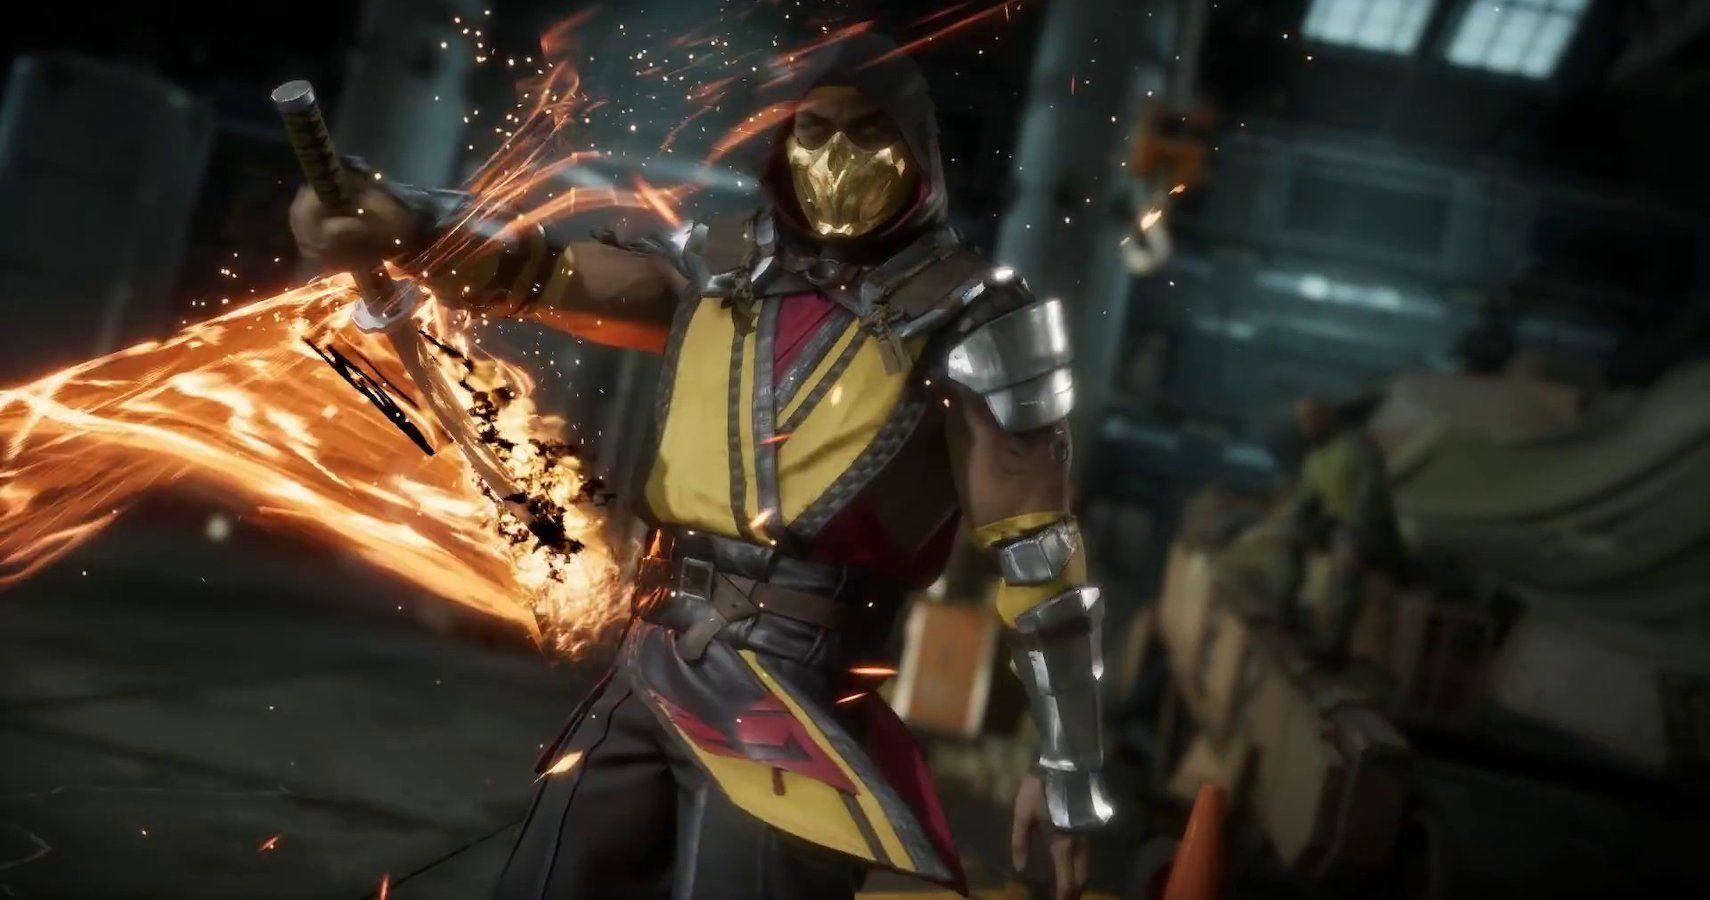 Mortal Kombat 10 Best Special Attacks Of Scorpion Ranked